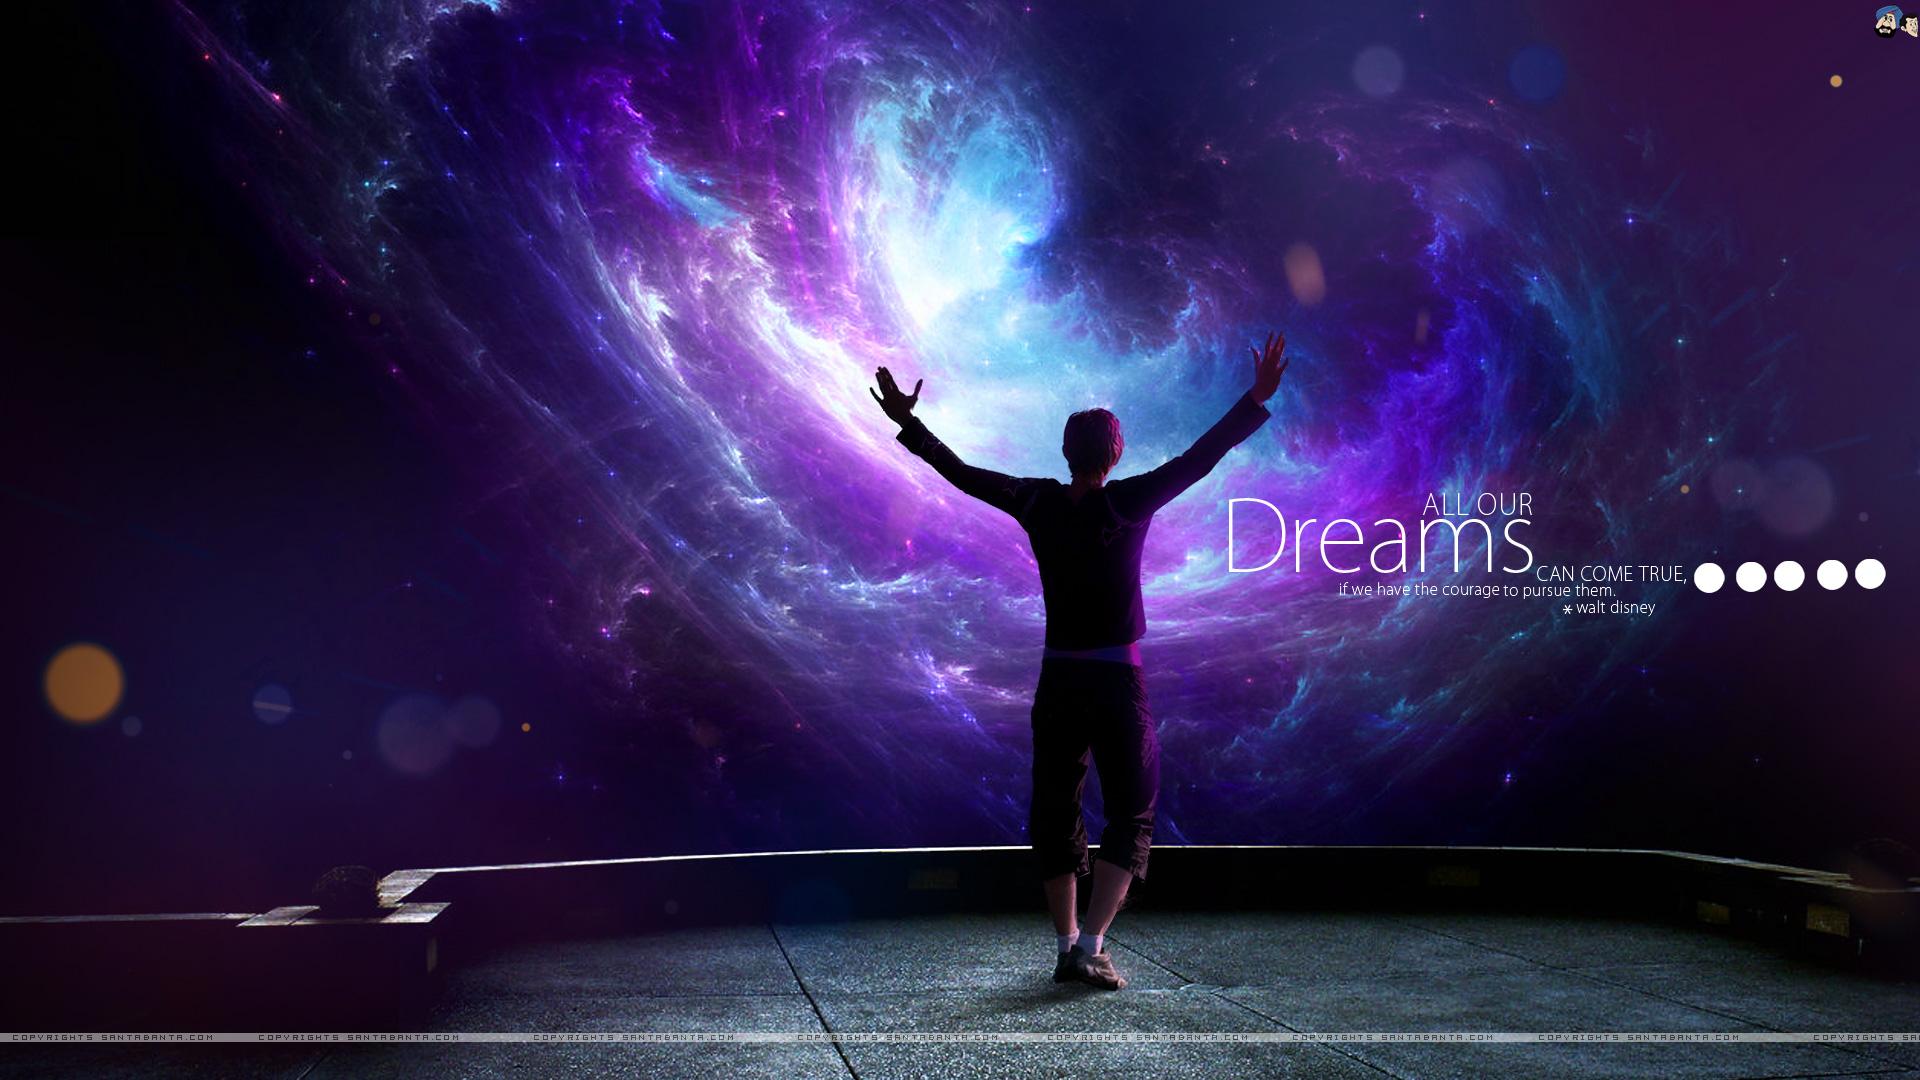 Dreams1.jpg (1920×1080)